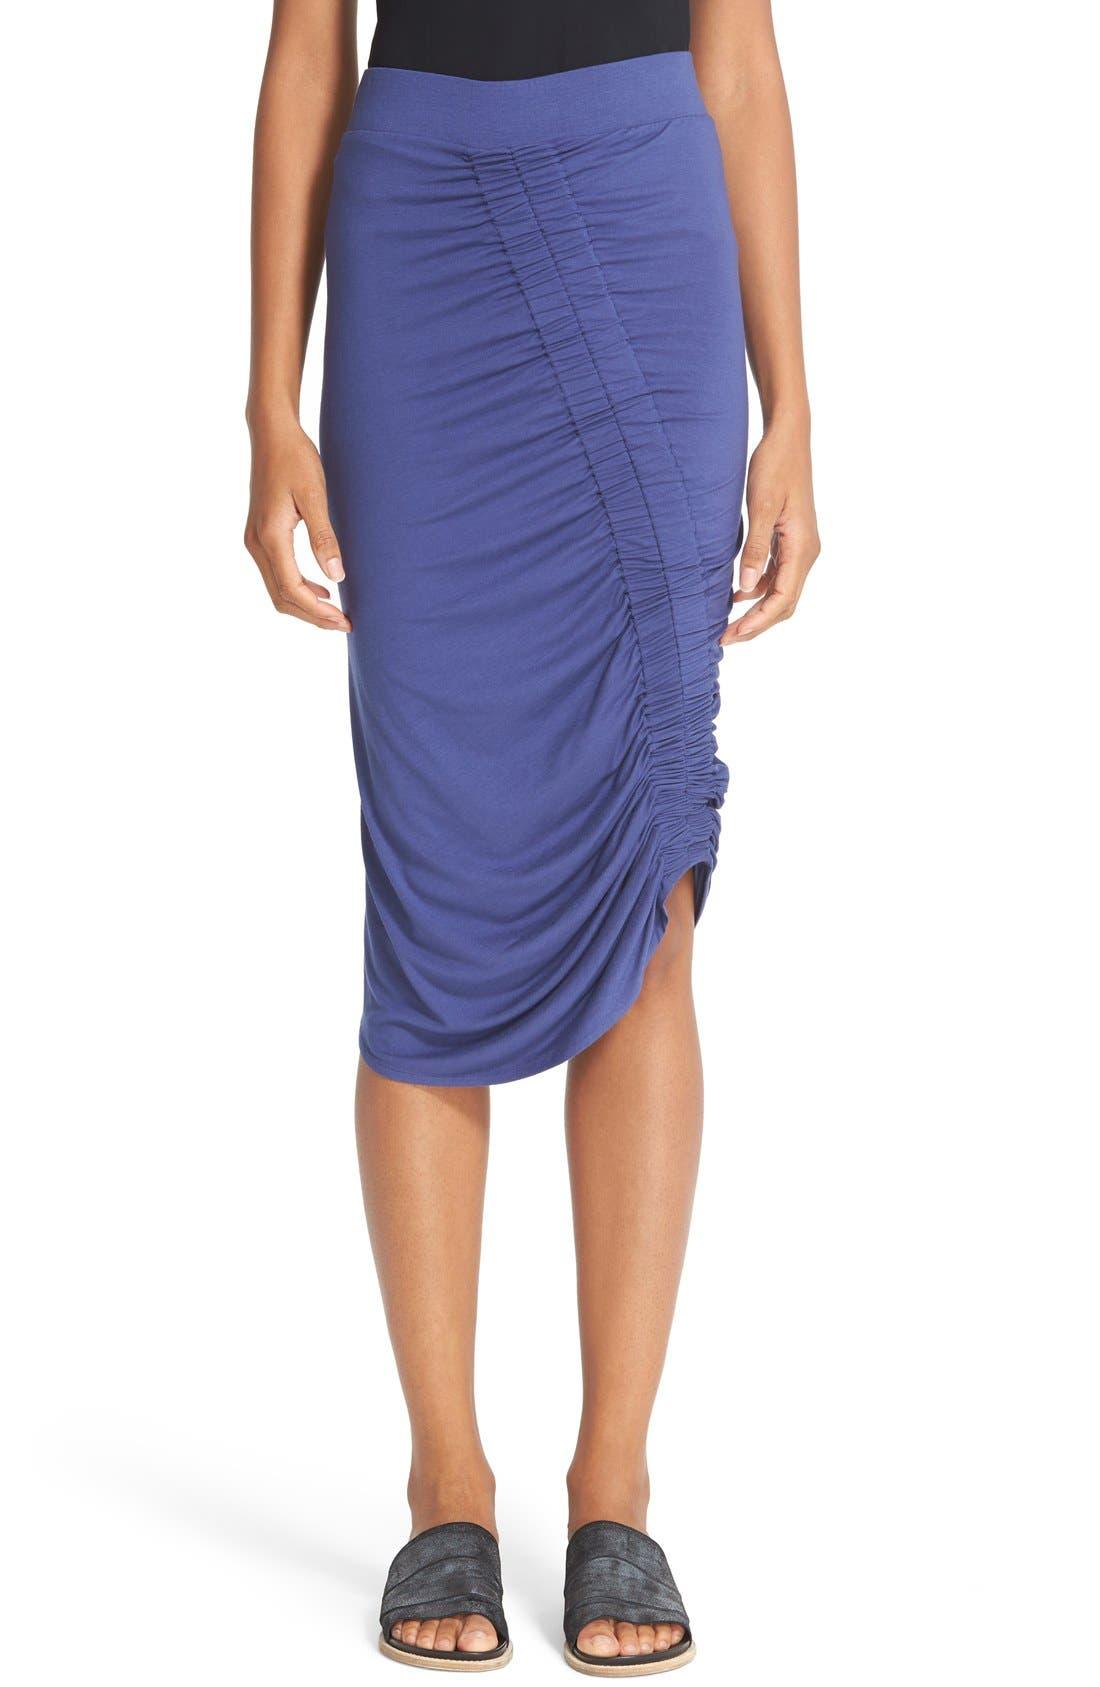 Alternate Image 1 Selected - Zero + Maria Cornejo 'Kia' Ruched Sim Jersey Skirt